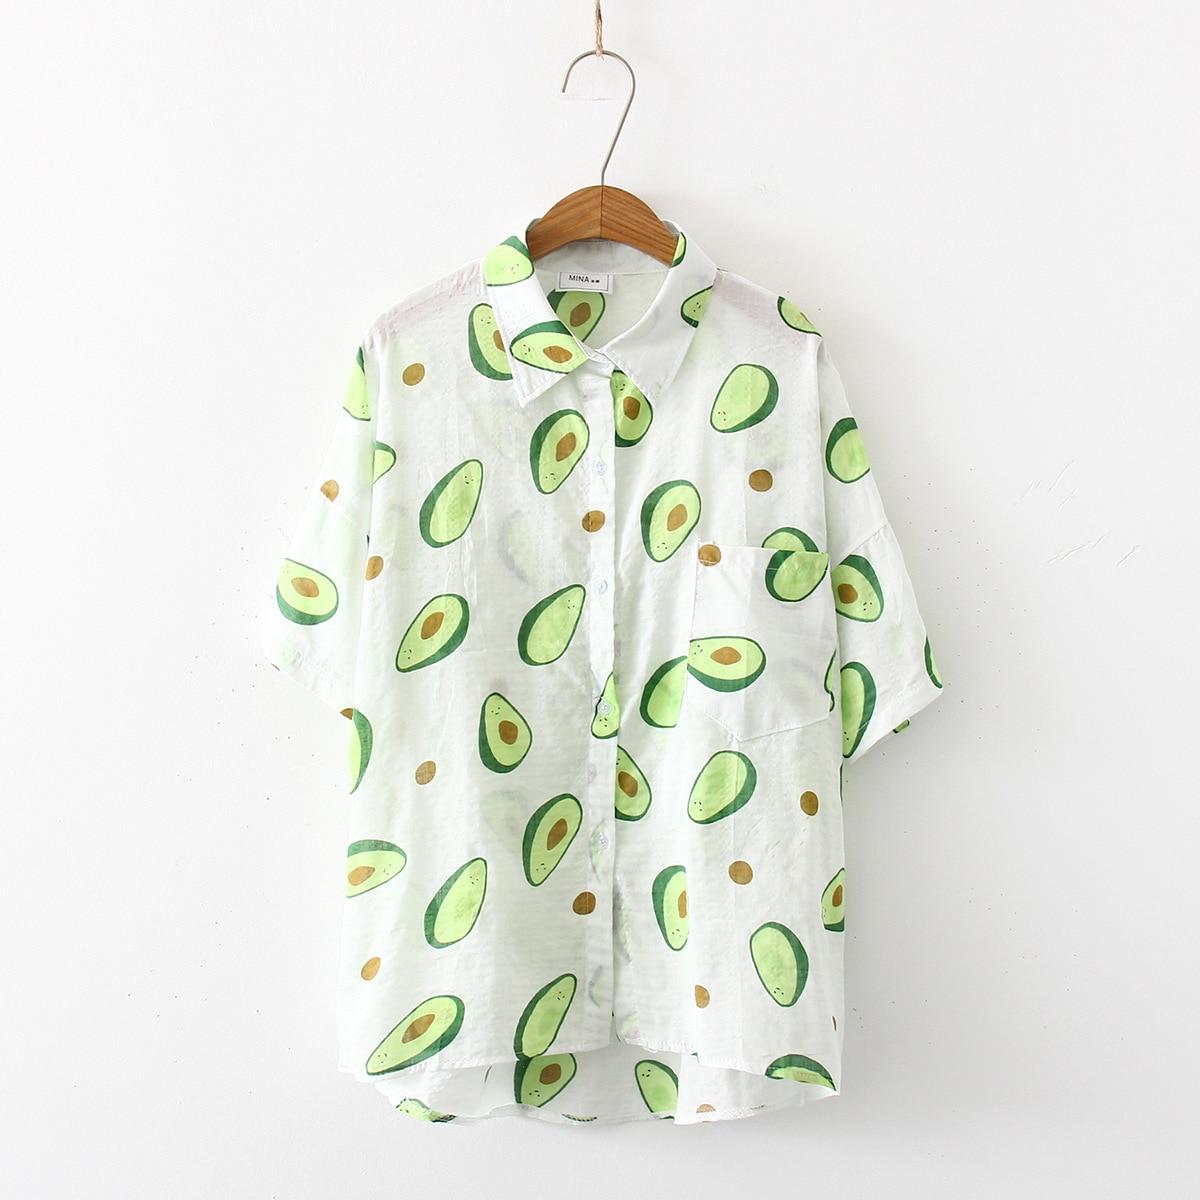 2019 Summer Blouse Shirts New Women Fashion Short Sleeve Floral Print Loose Casual Tops Shirts Blusas